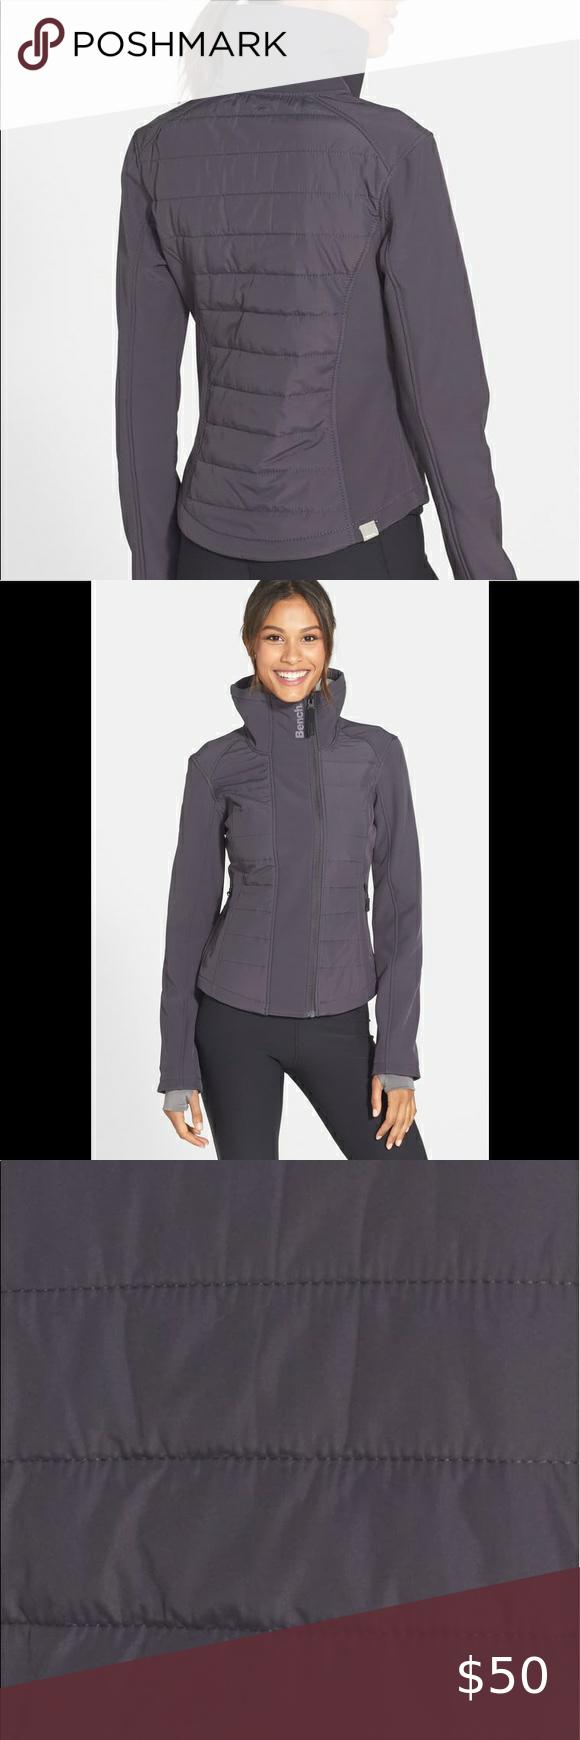 Bench Wisecrack B Jacket Embroidered Bomber Jacket Bench Jackets Coats Jackets Women [ 1740 x 580 Pixel ]